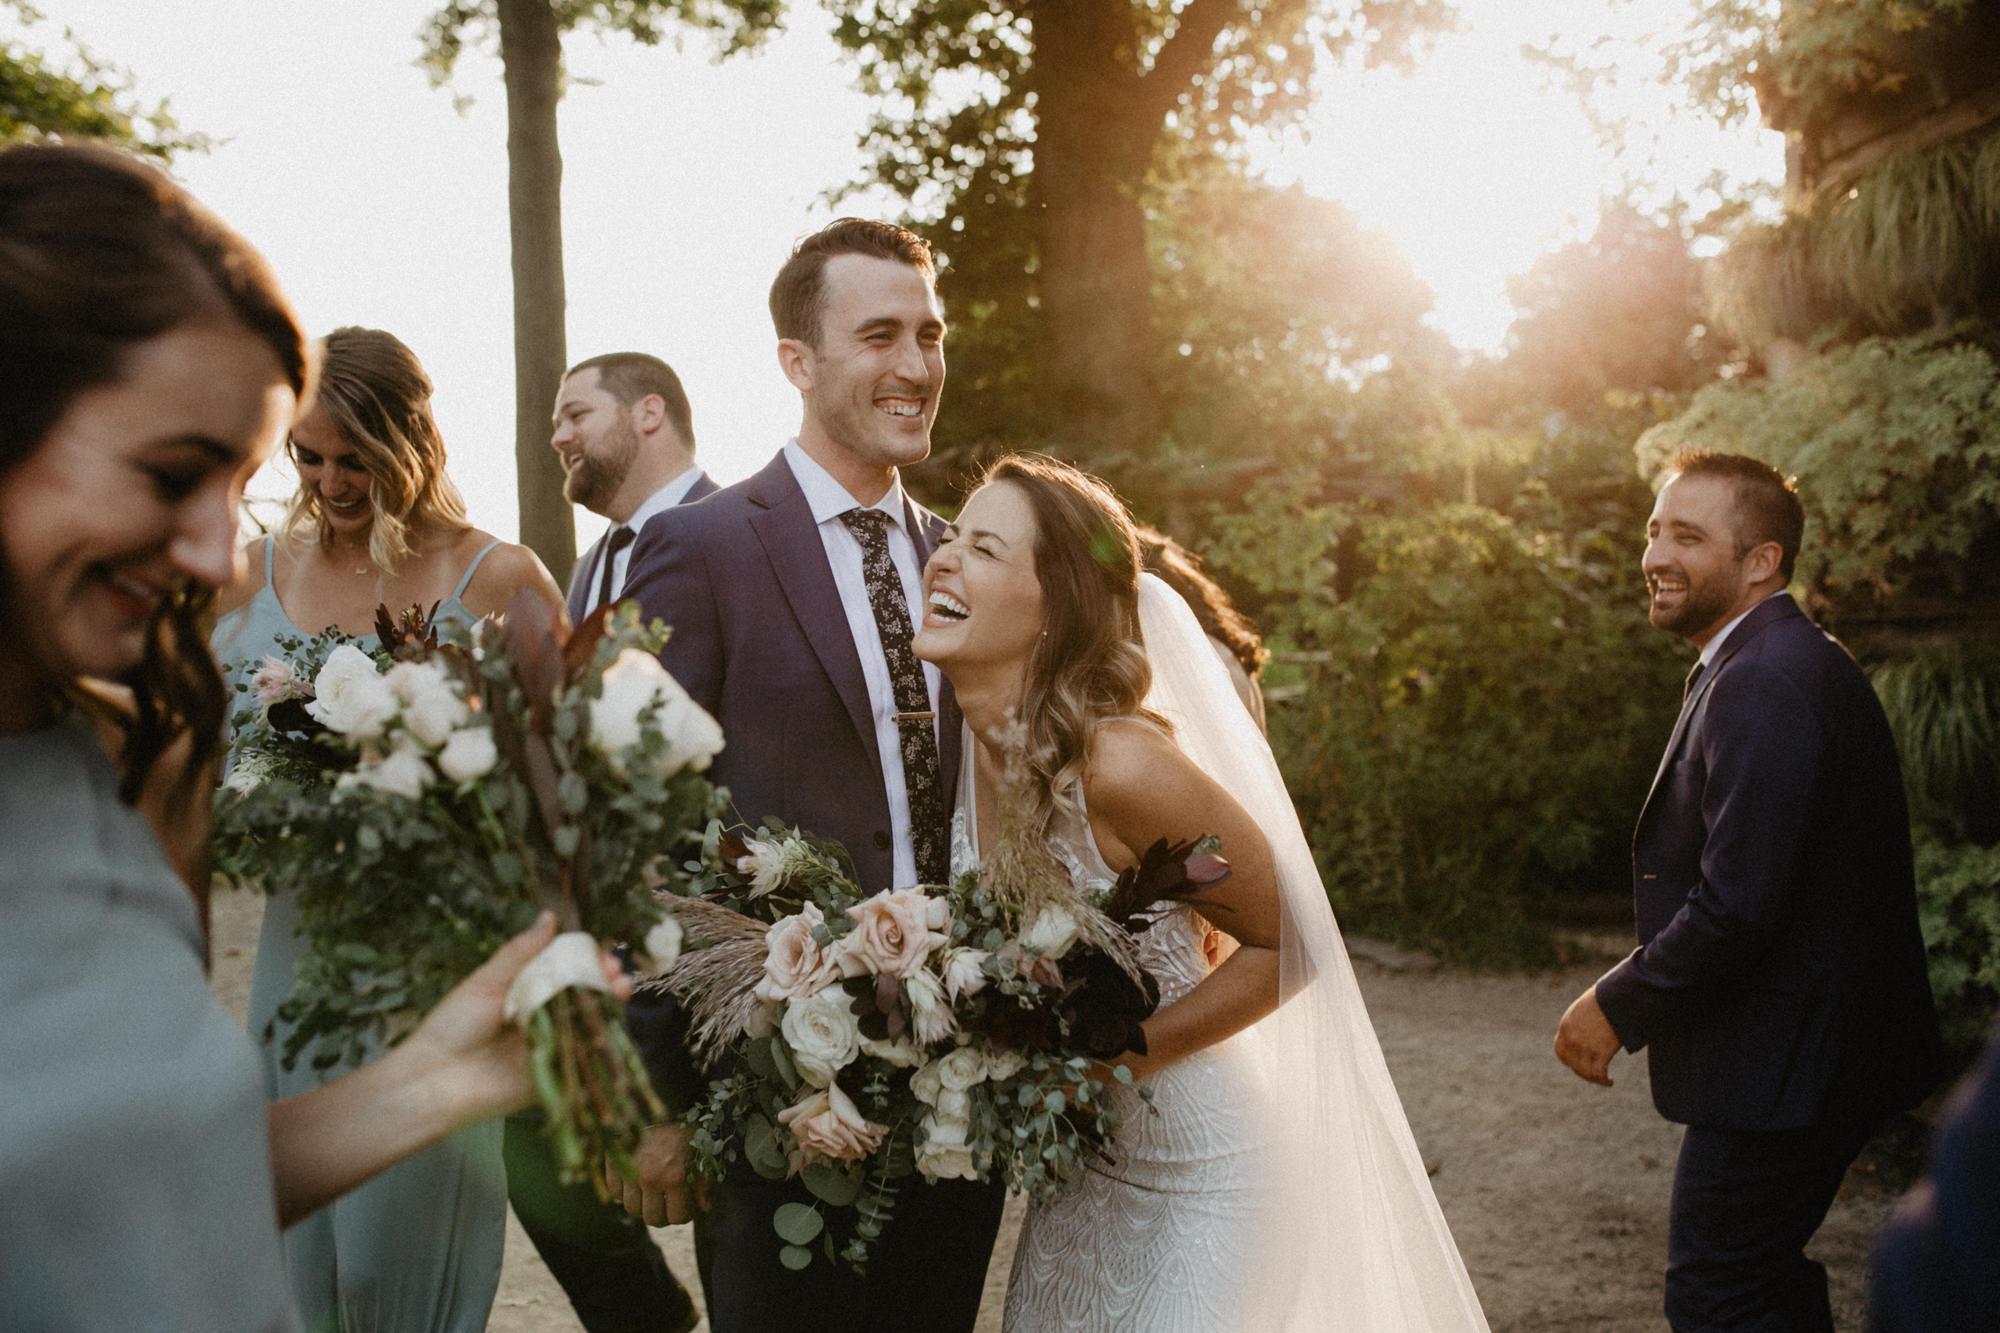 terrain-events-wedding-photographer-40.jpg